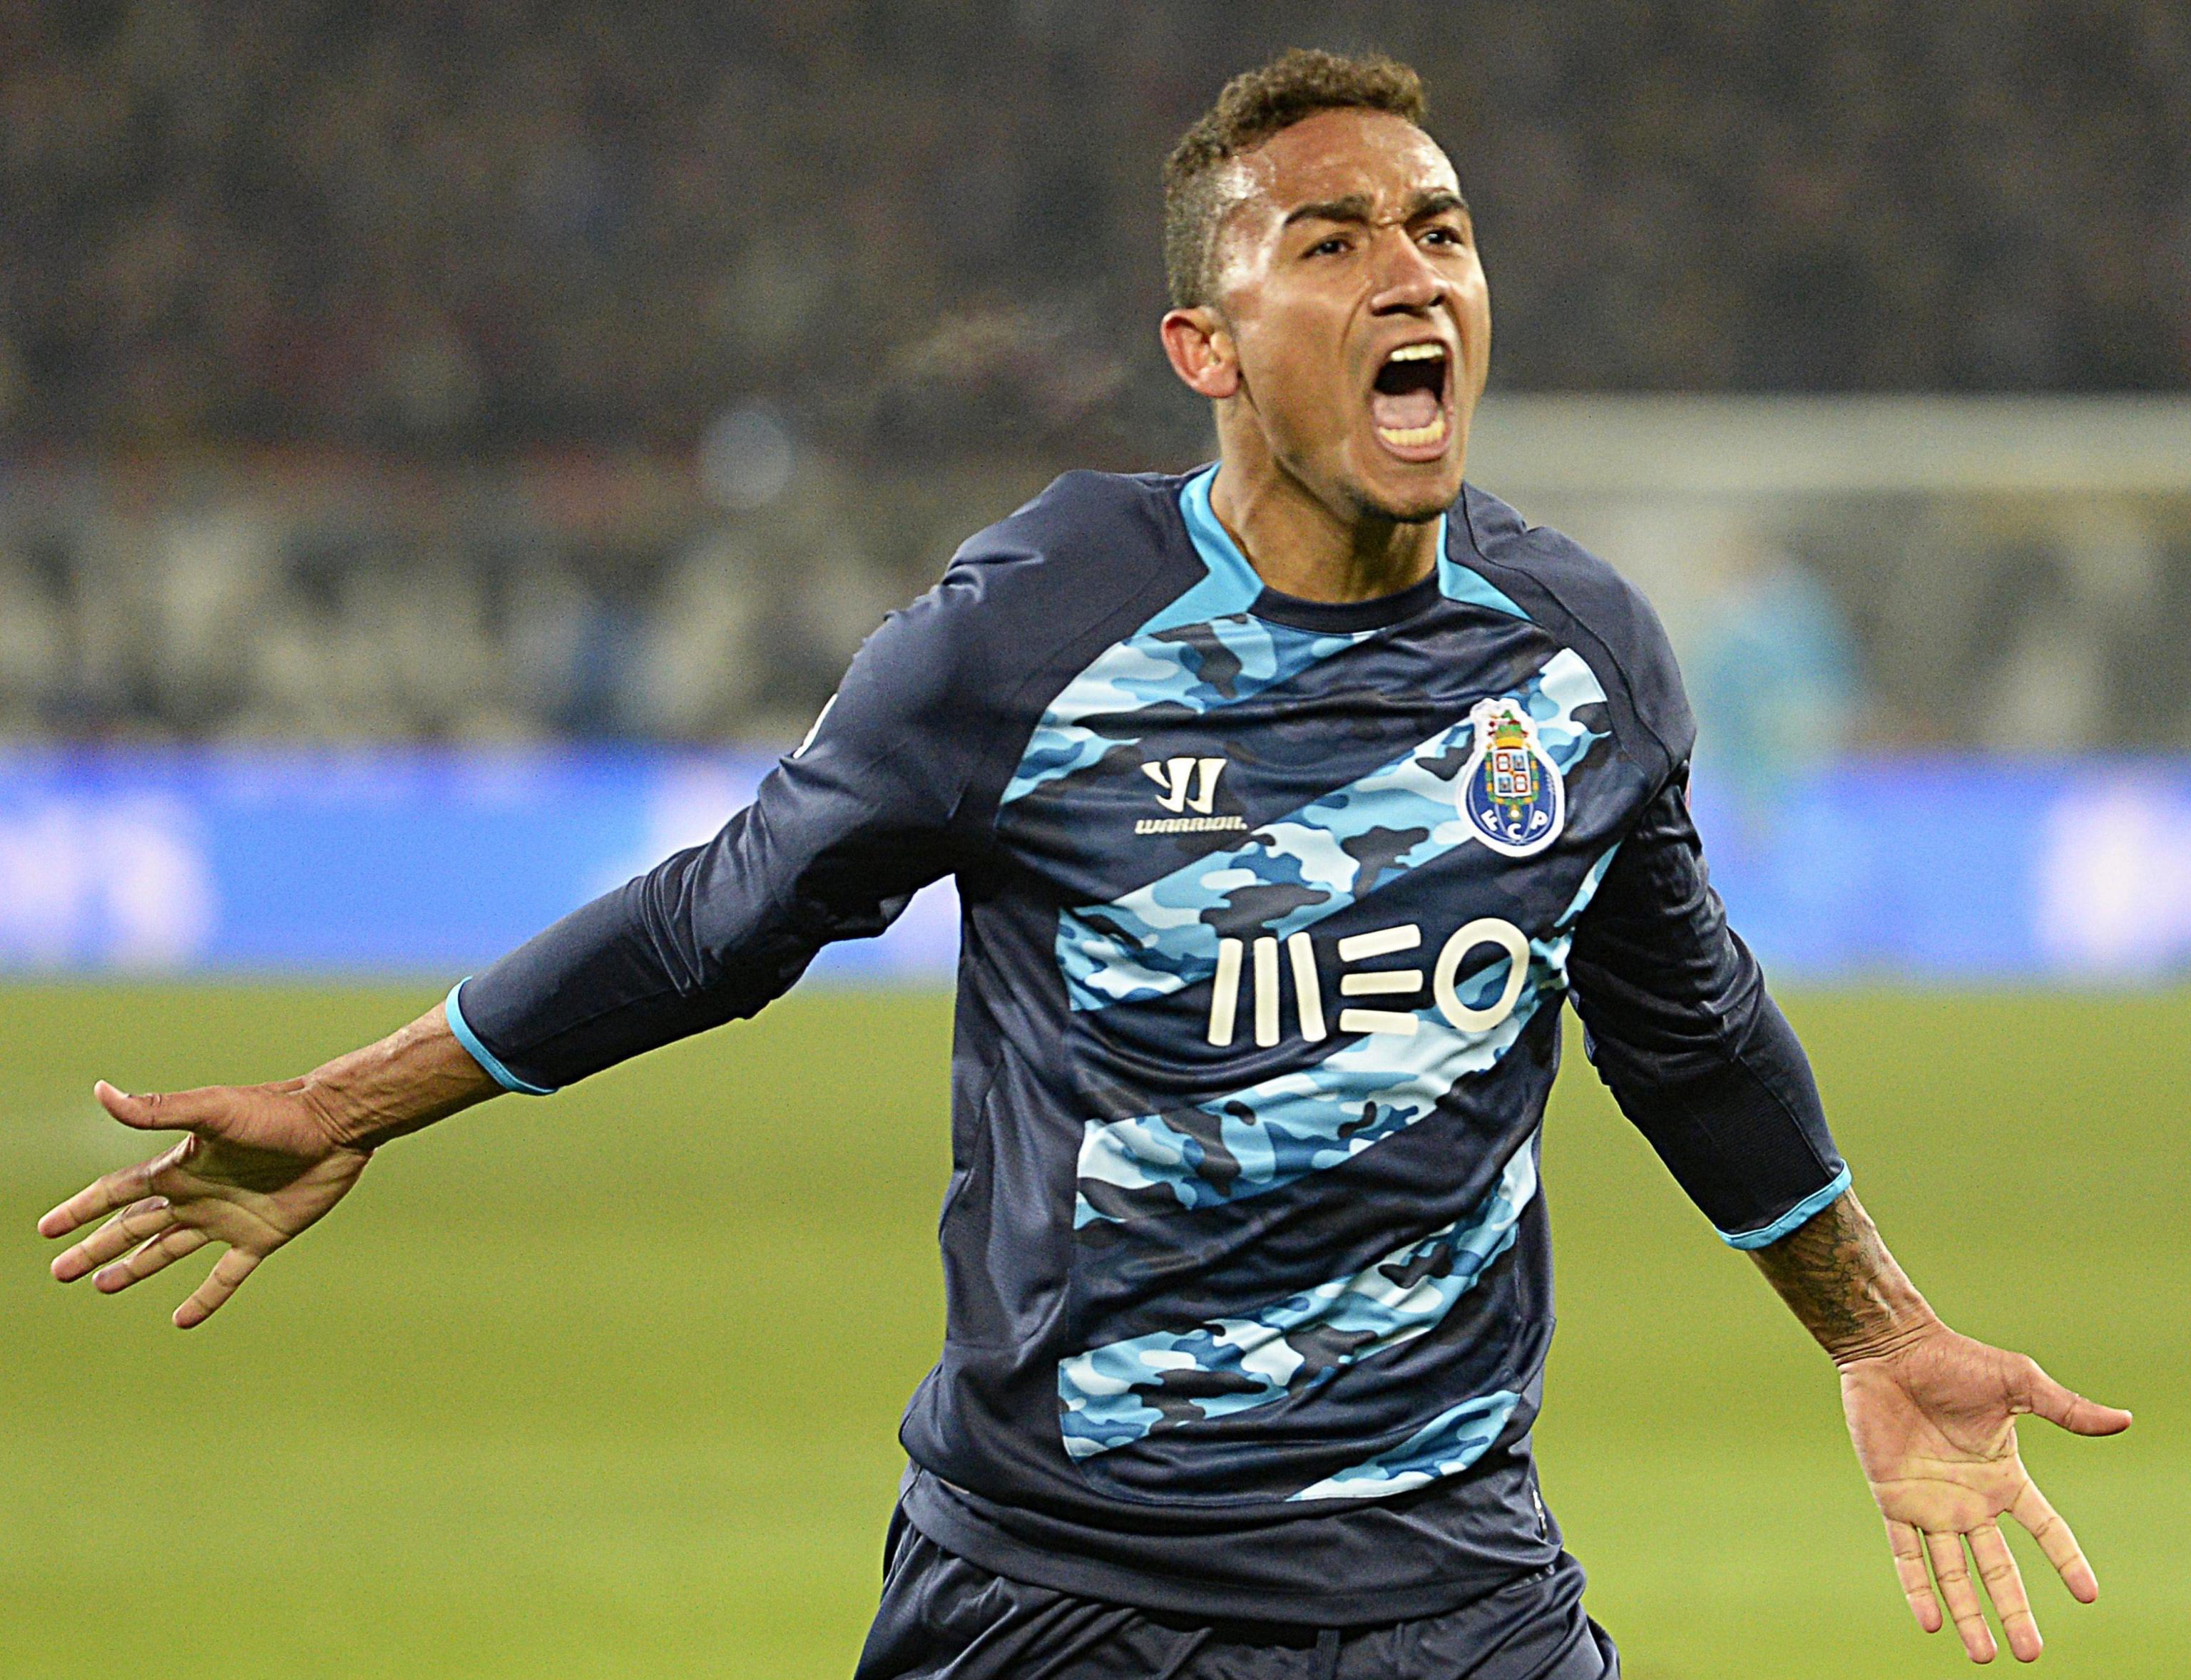 Danilo Luiz da Silva alla Juventus